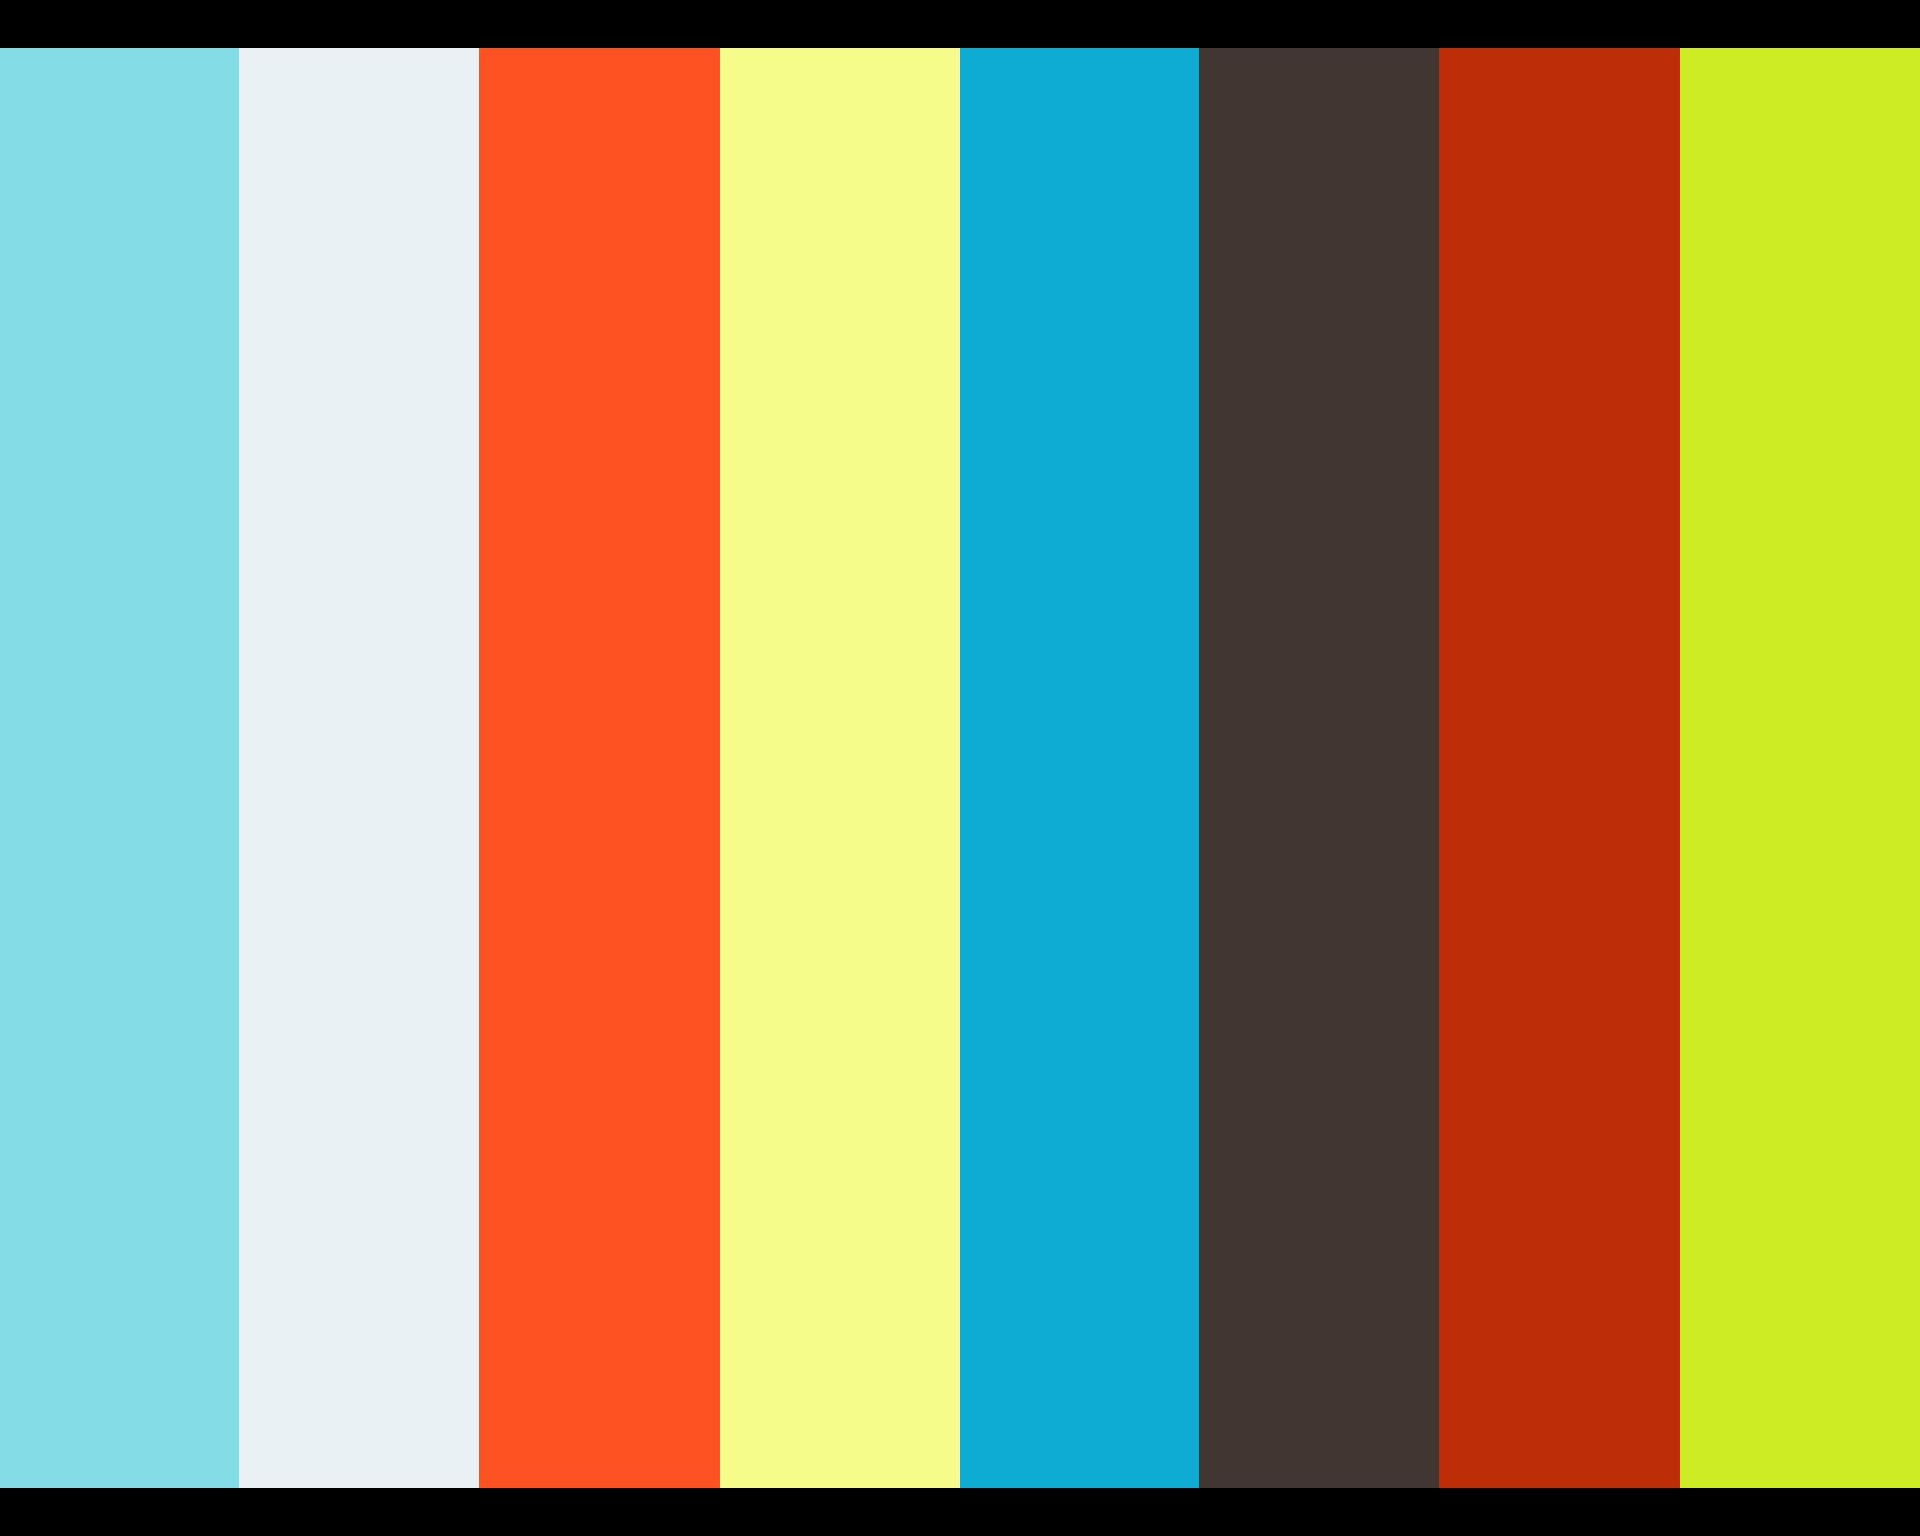 iptv enigma2 - iptv enigma2 Video - iptv enigma2 MP3